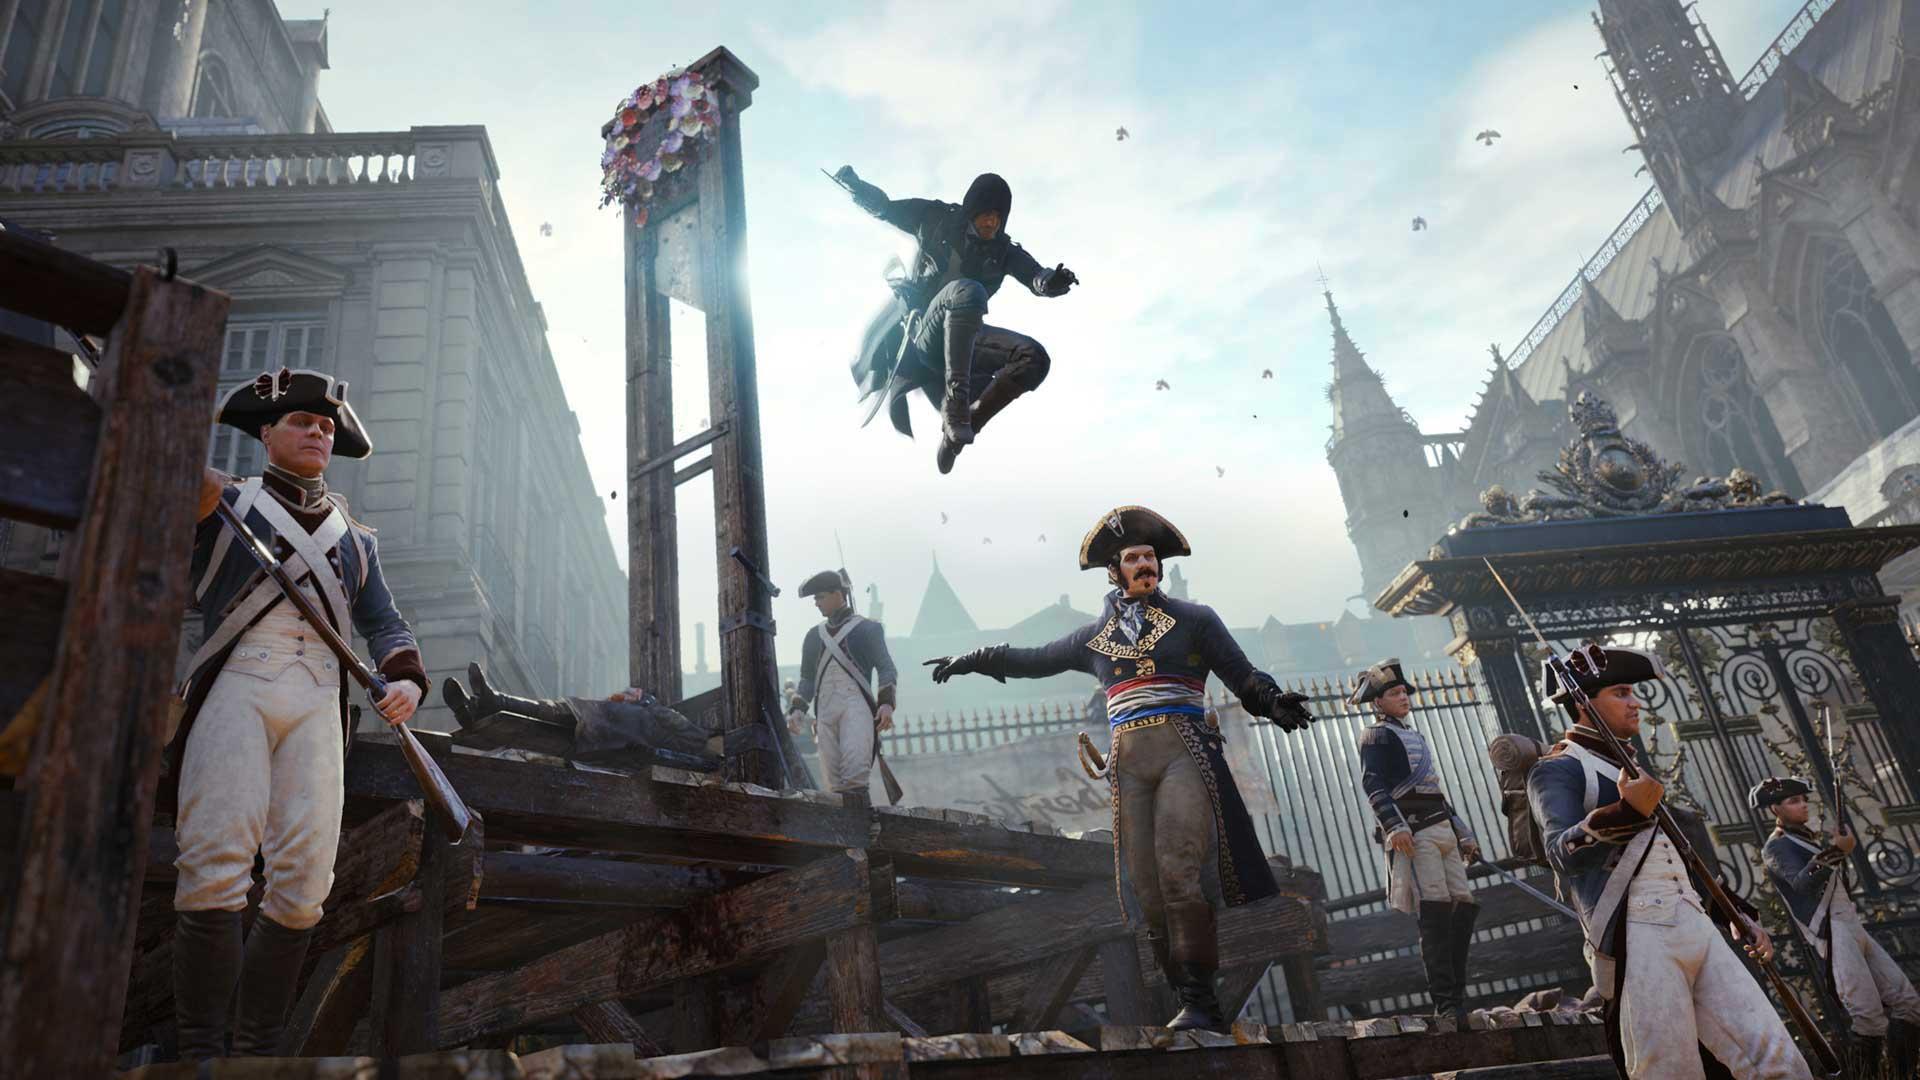 Руководство по загадке Нострадамуса в игре Assassin's Creed Unity (Терра)